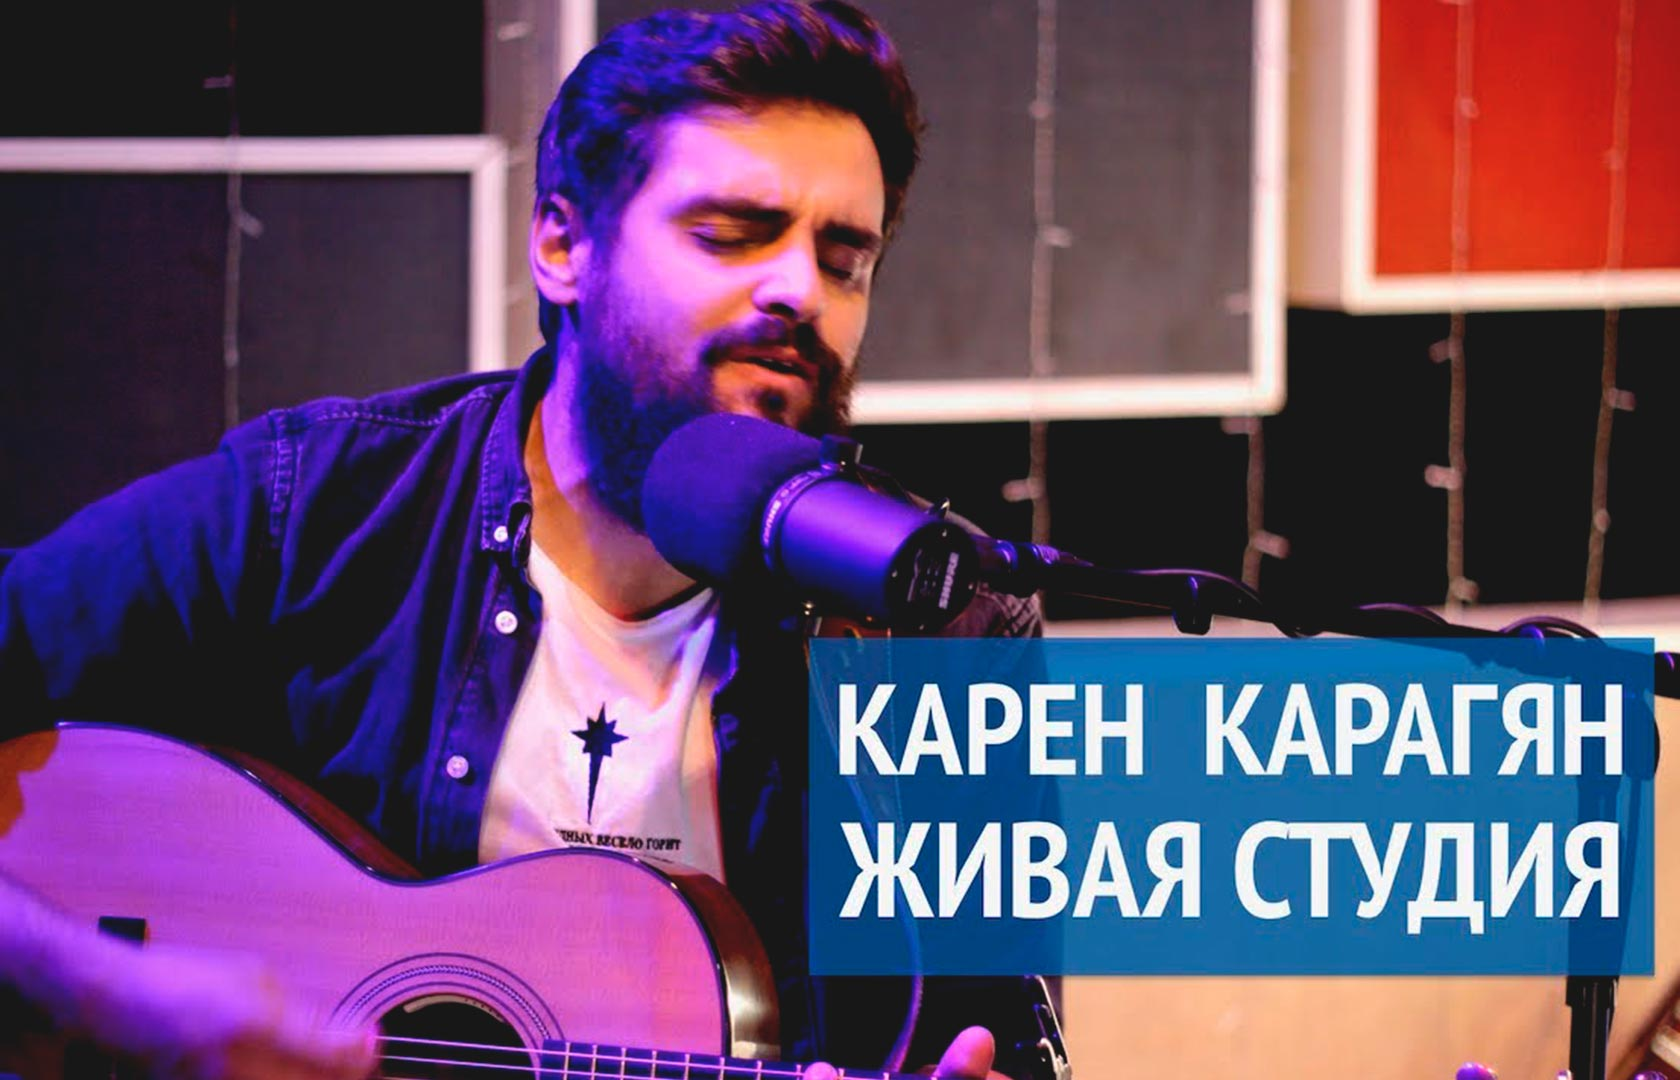 Карен Карагян | Слово Жизни Москва | Живая Студия